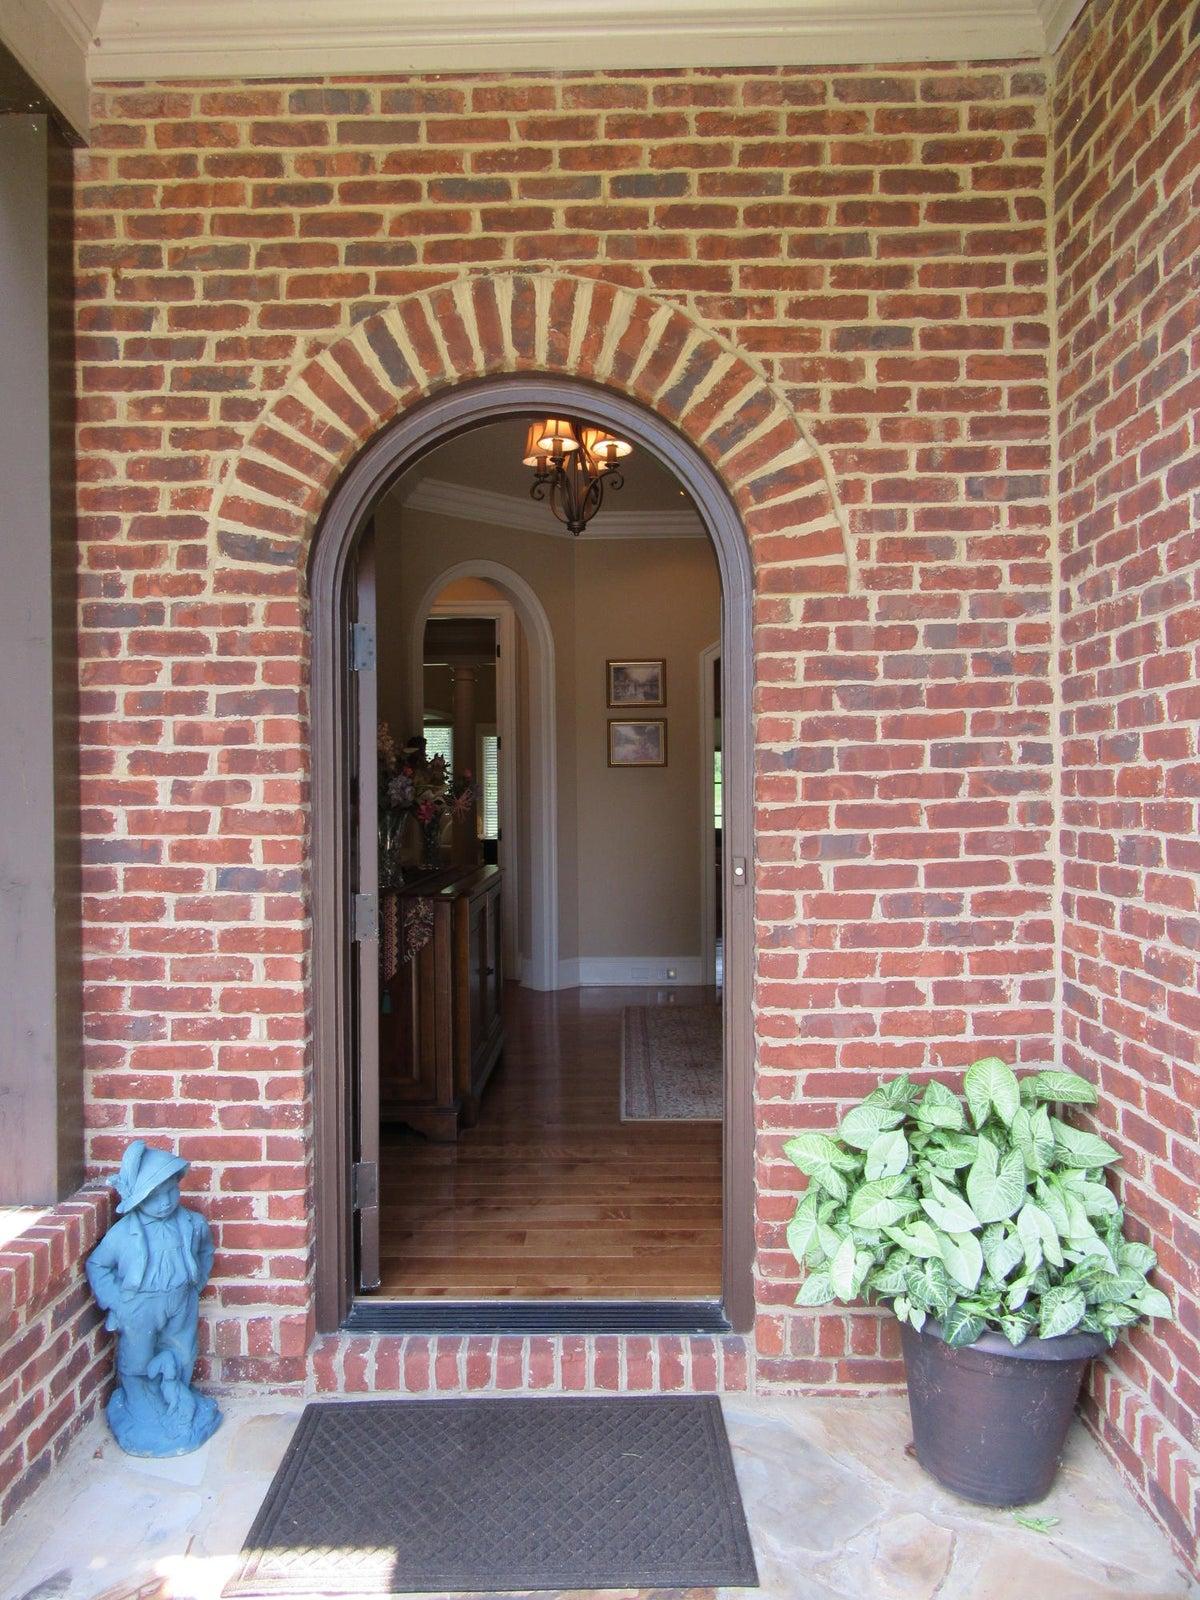 Beautiul brick entrance